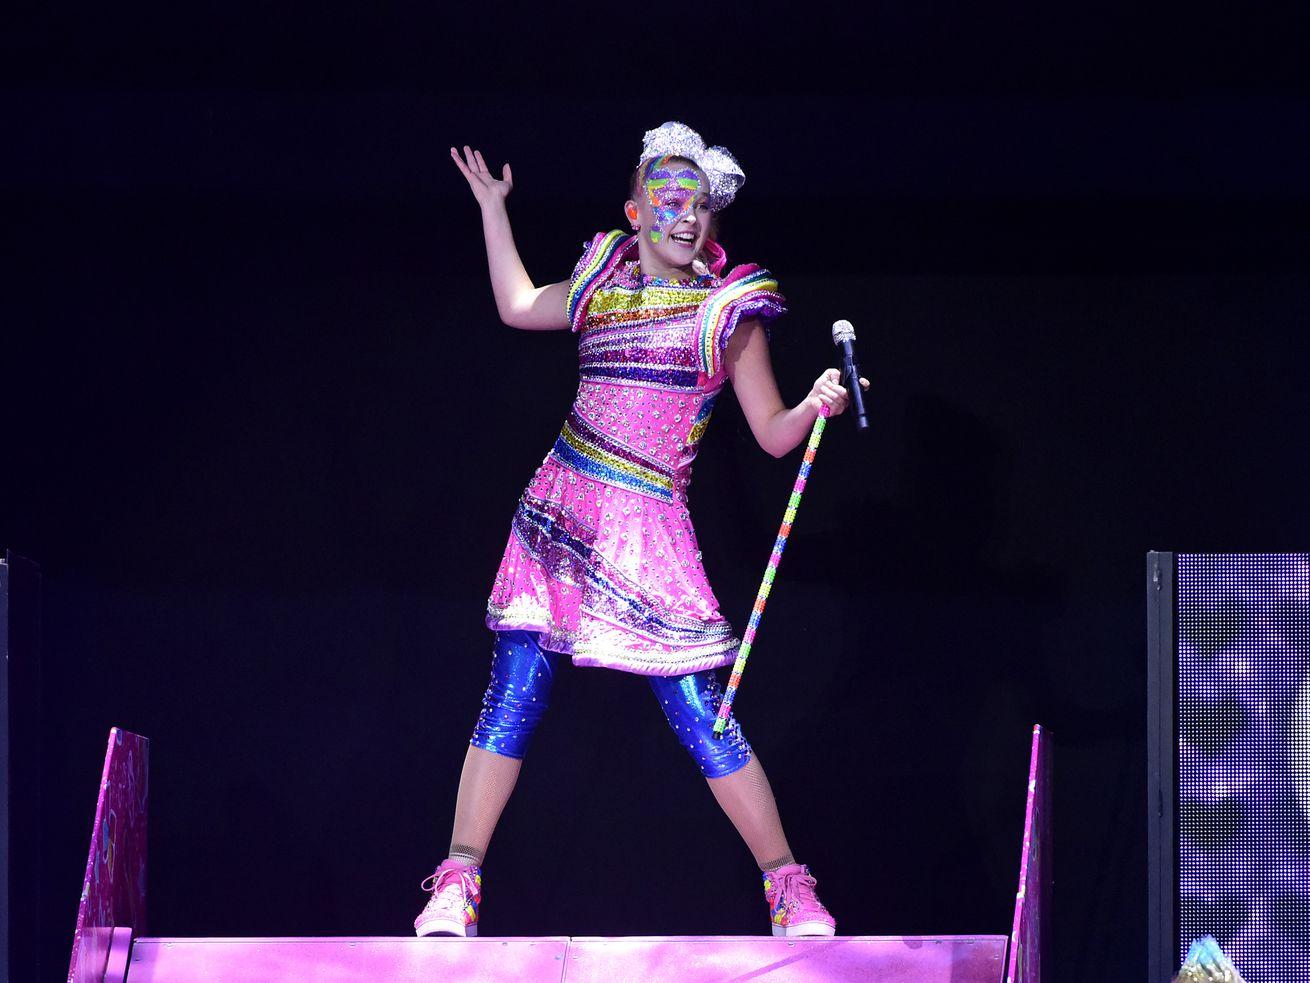 Singer JoJo Siwa performs at the Honda Center on in 2019 in Anaheim, California.